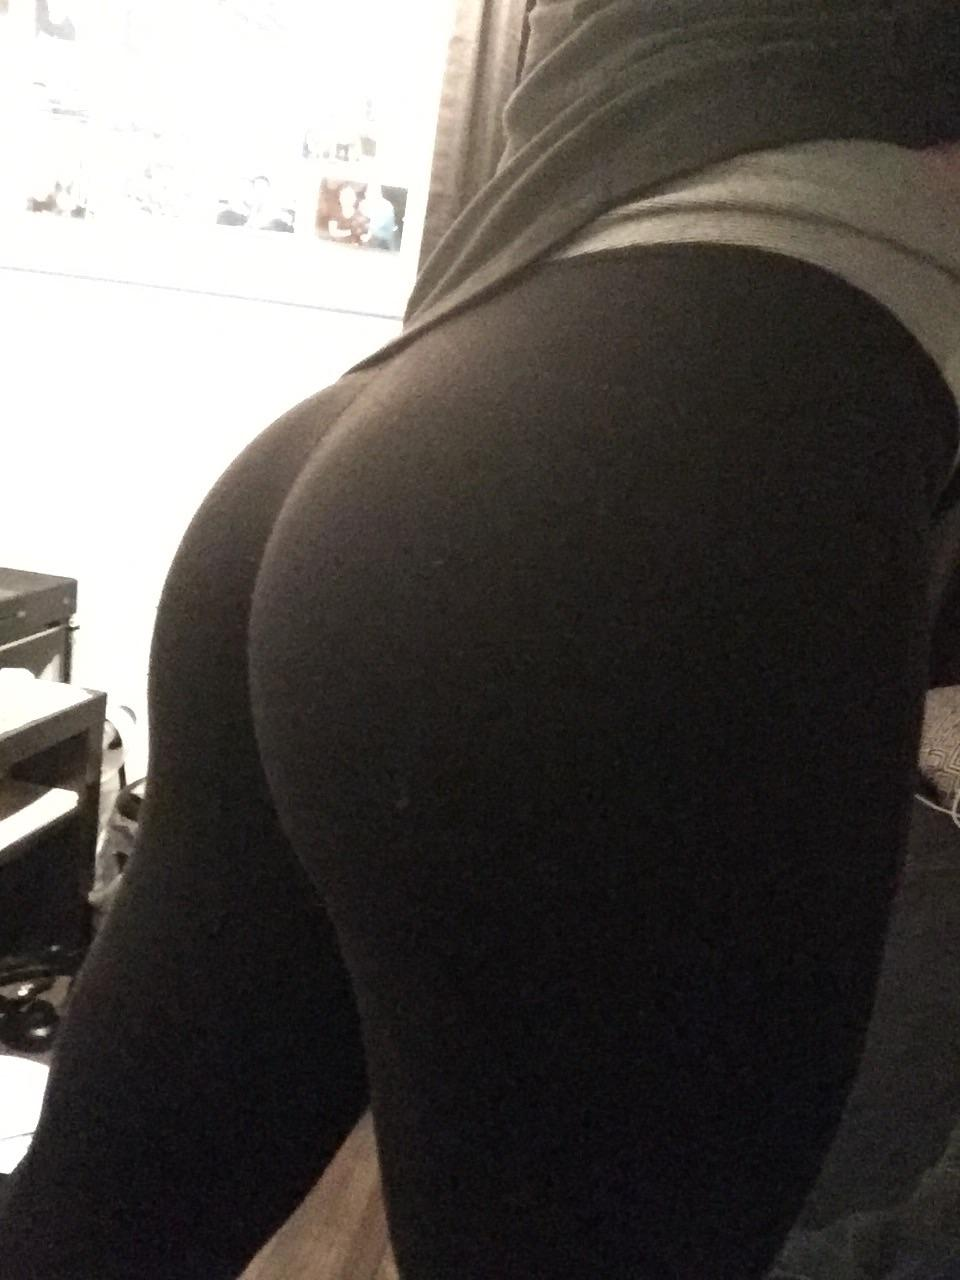 Yogapants Reddit : yogapants, reddit, LuLuLemon, Pants,, Scared, Thoughts, Crossdressing